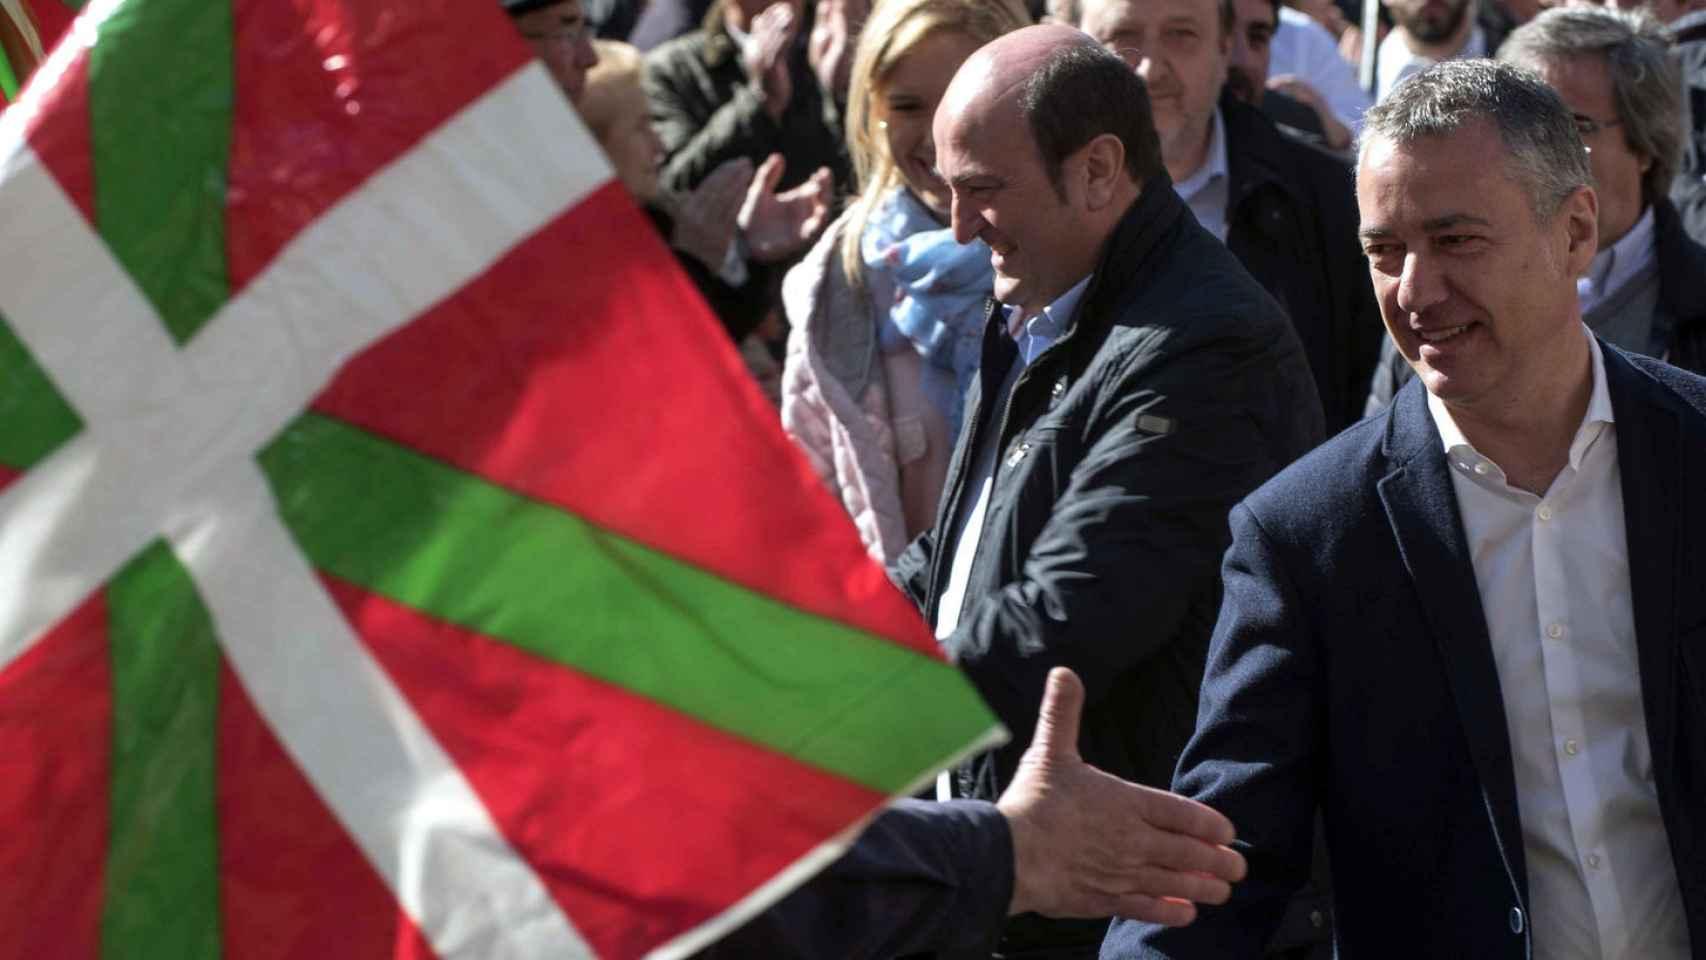 Podemos-Urkullu-pedir-confederacion-vascos_112749533_3001446_1706x1280